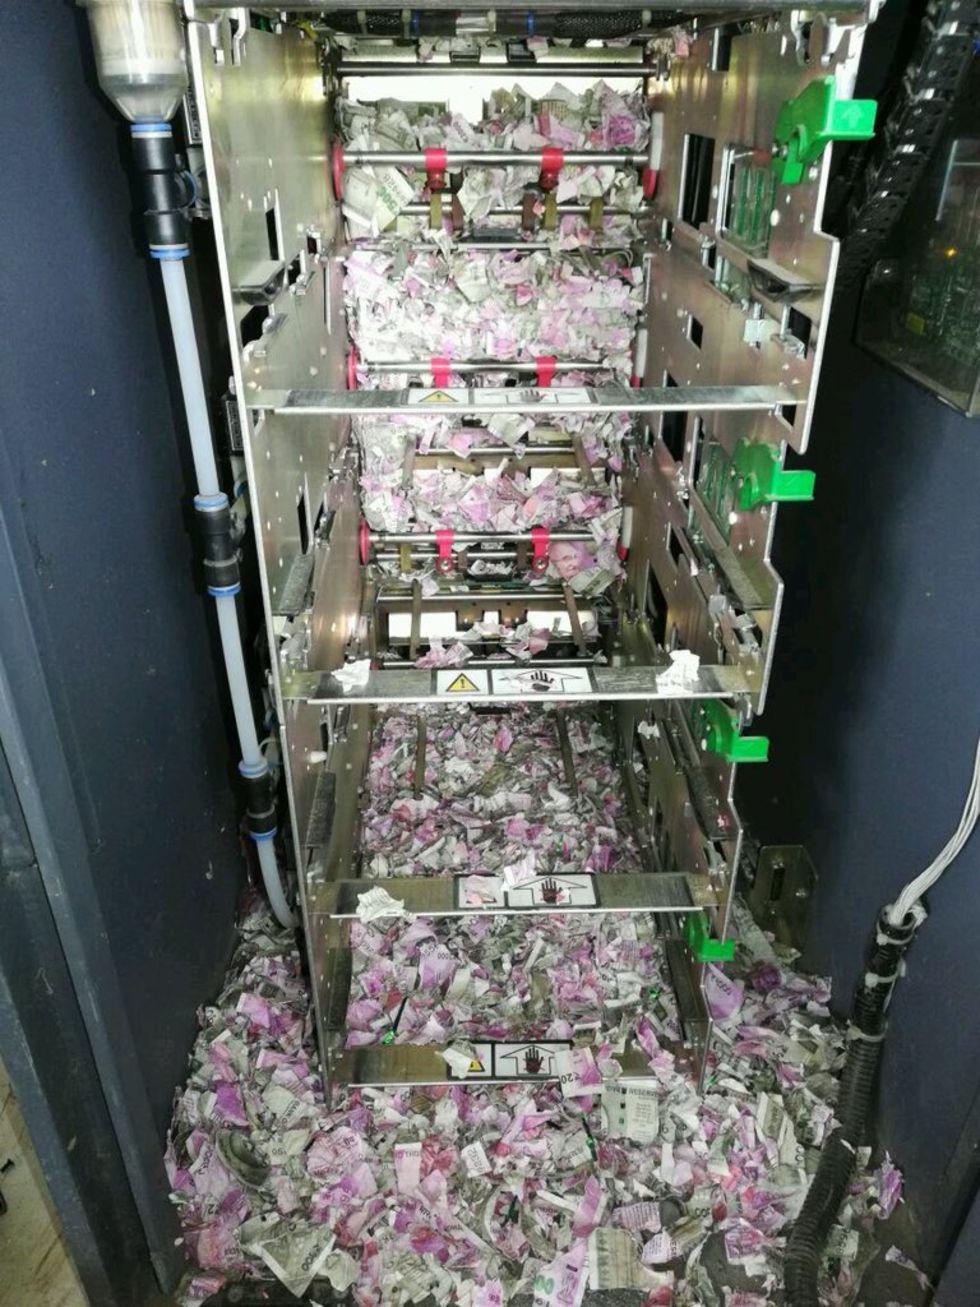 Råtta bröt sig in i indisk bankomat